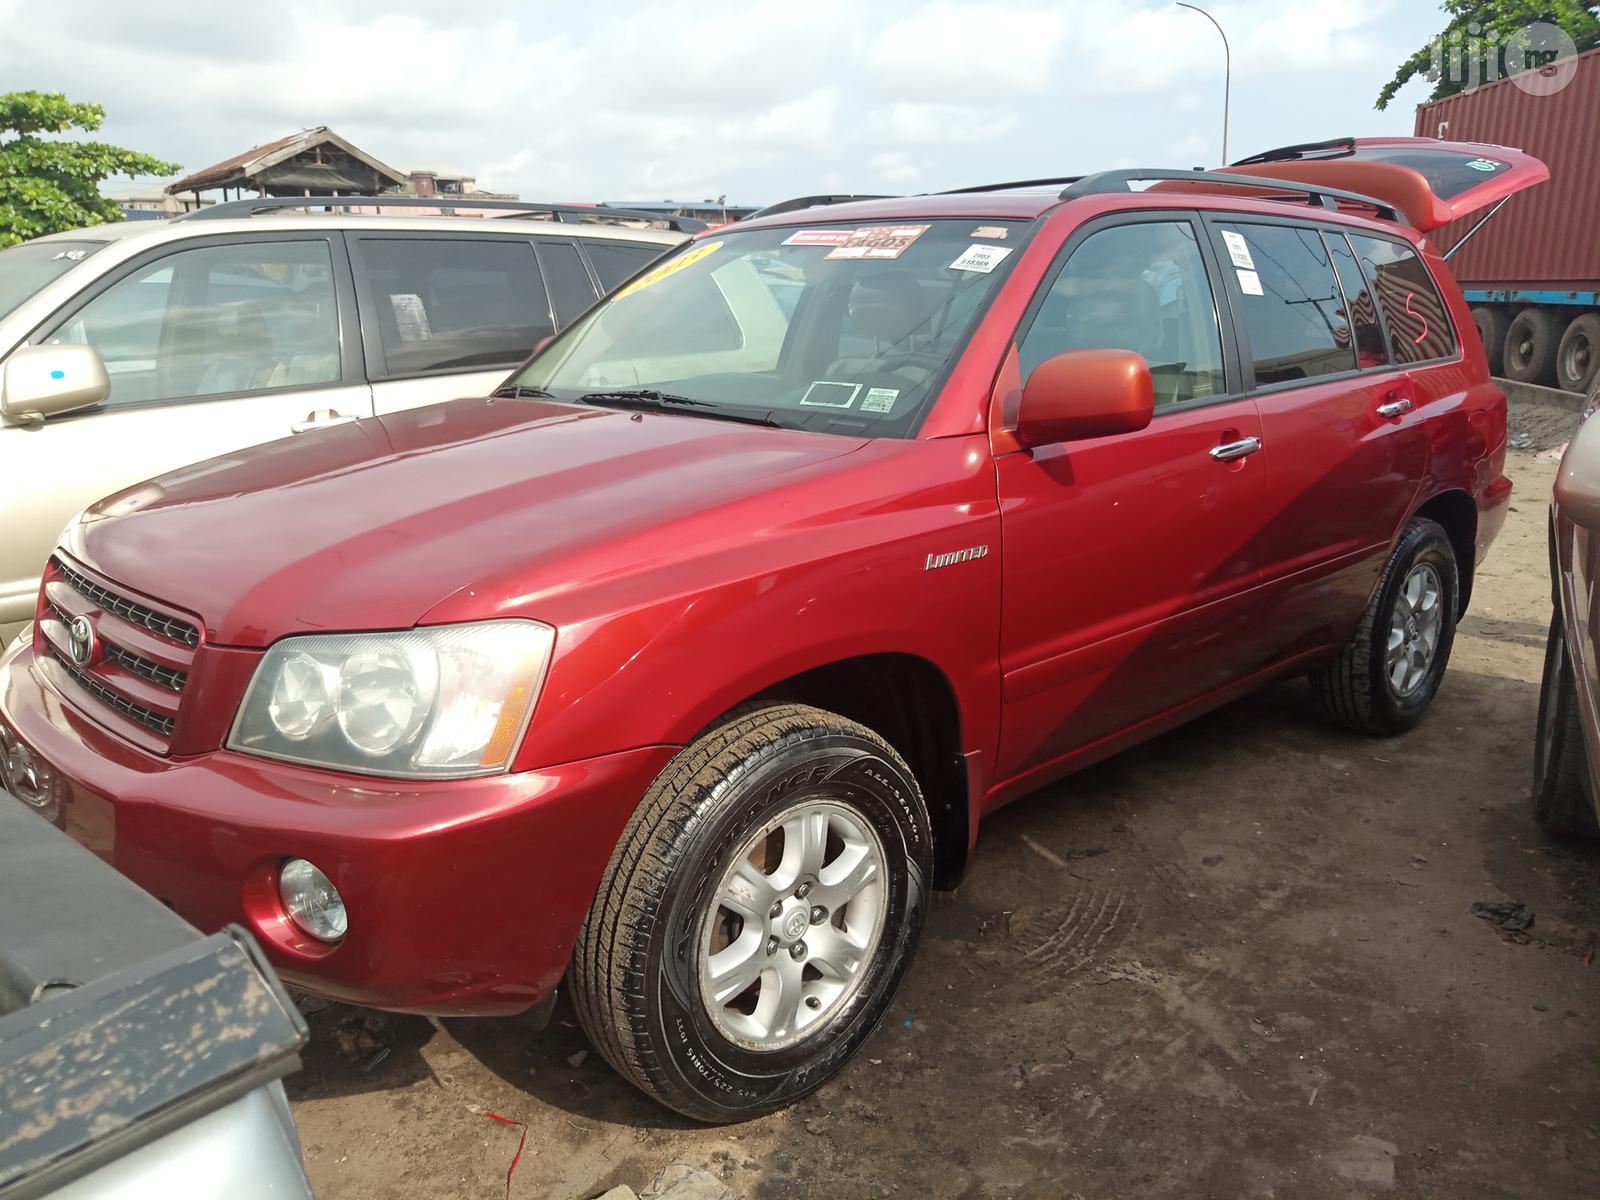 Archive: Toyota Highlander 2003 Red